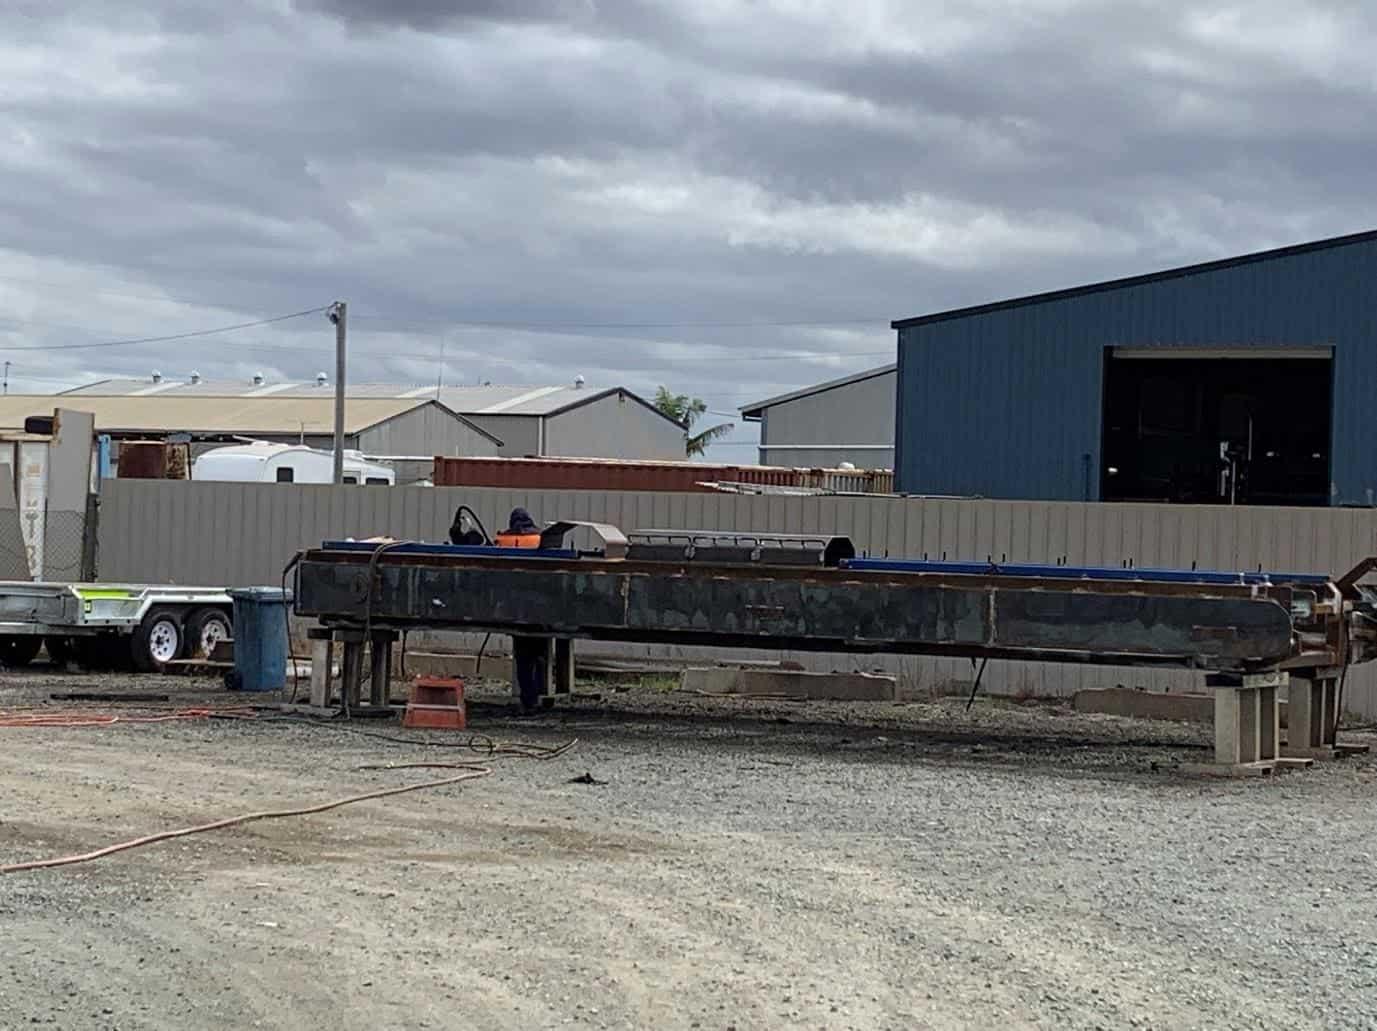 underground conveyor car in our site 1 maintenance & supply